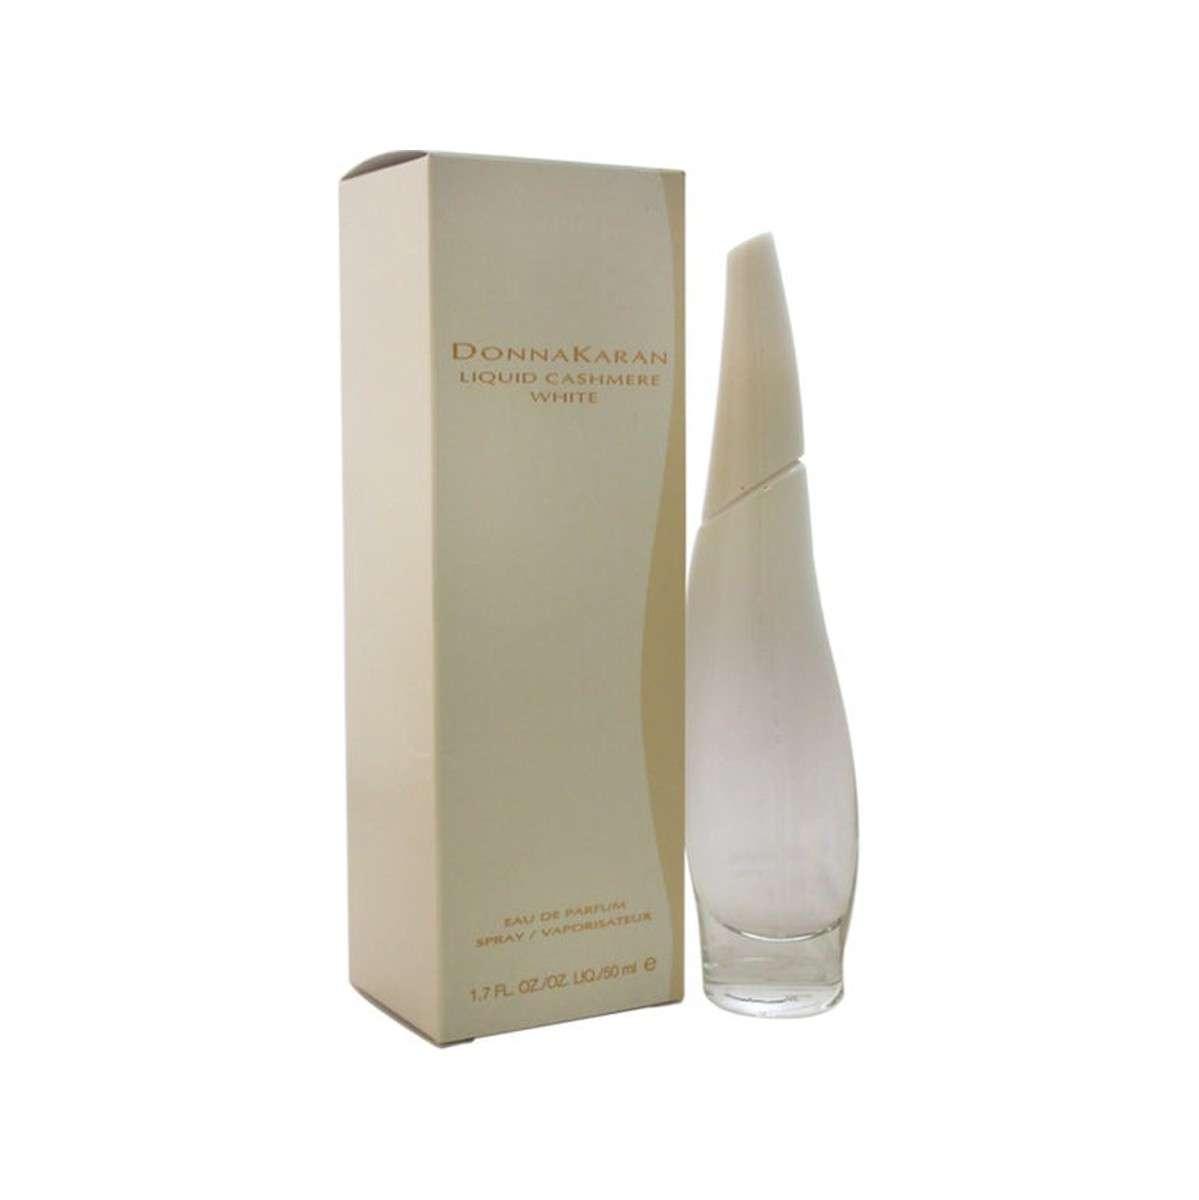 Dkny Liquid Cashmere Wht   Perfume N Cologne